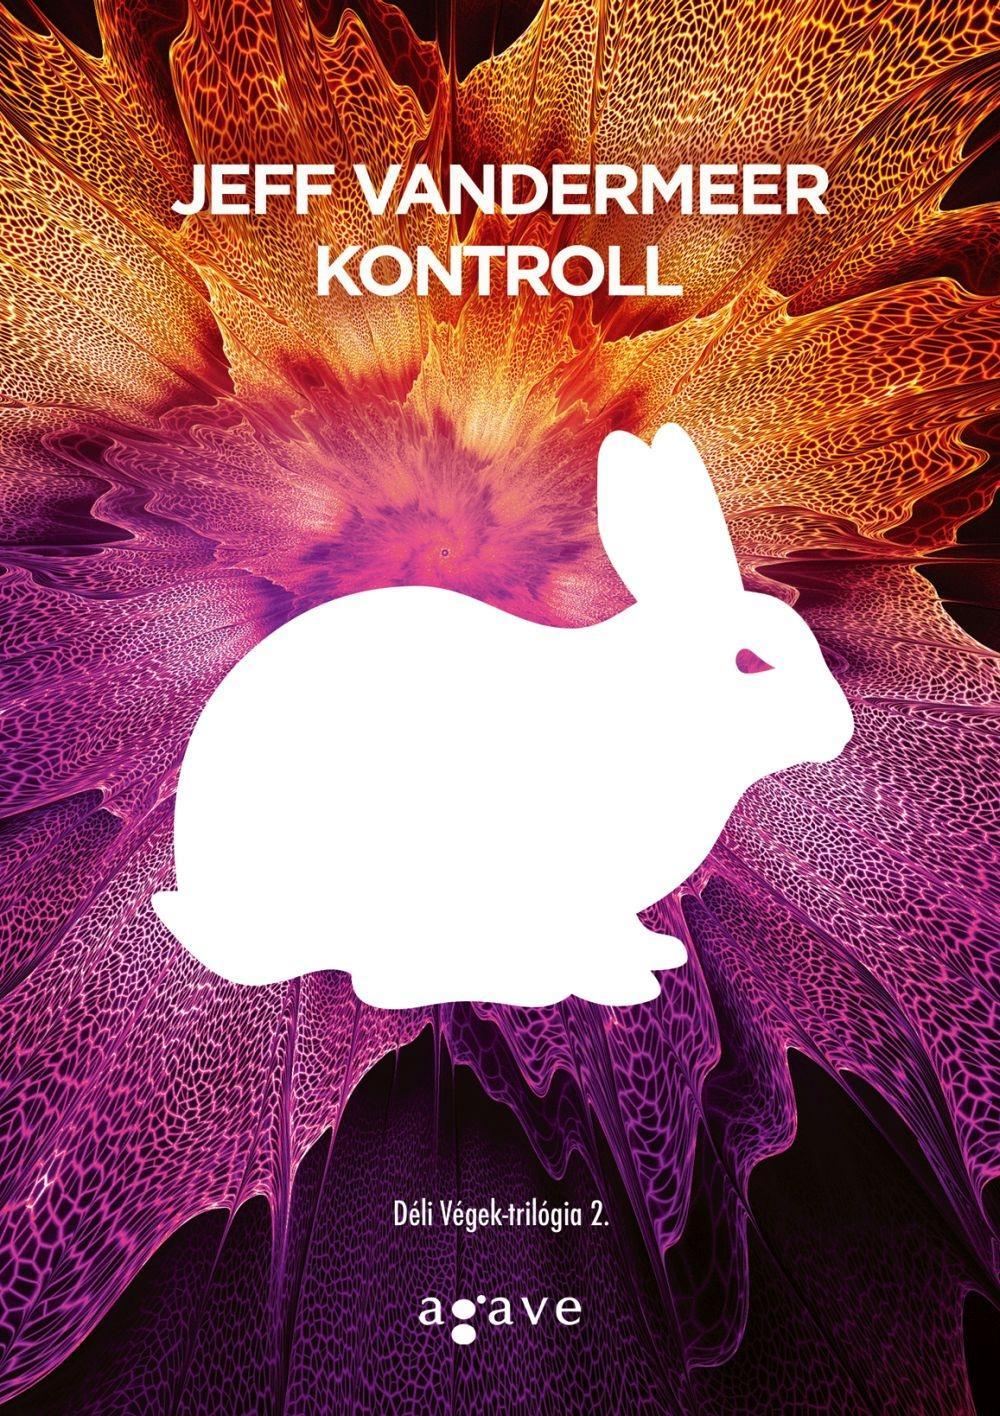 KONTROLL - DÉLI VÉGEK-TRILÓGIA 2.